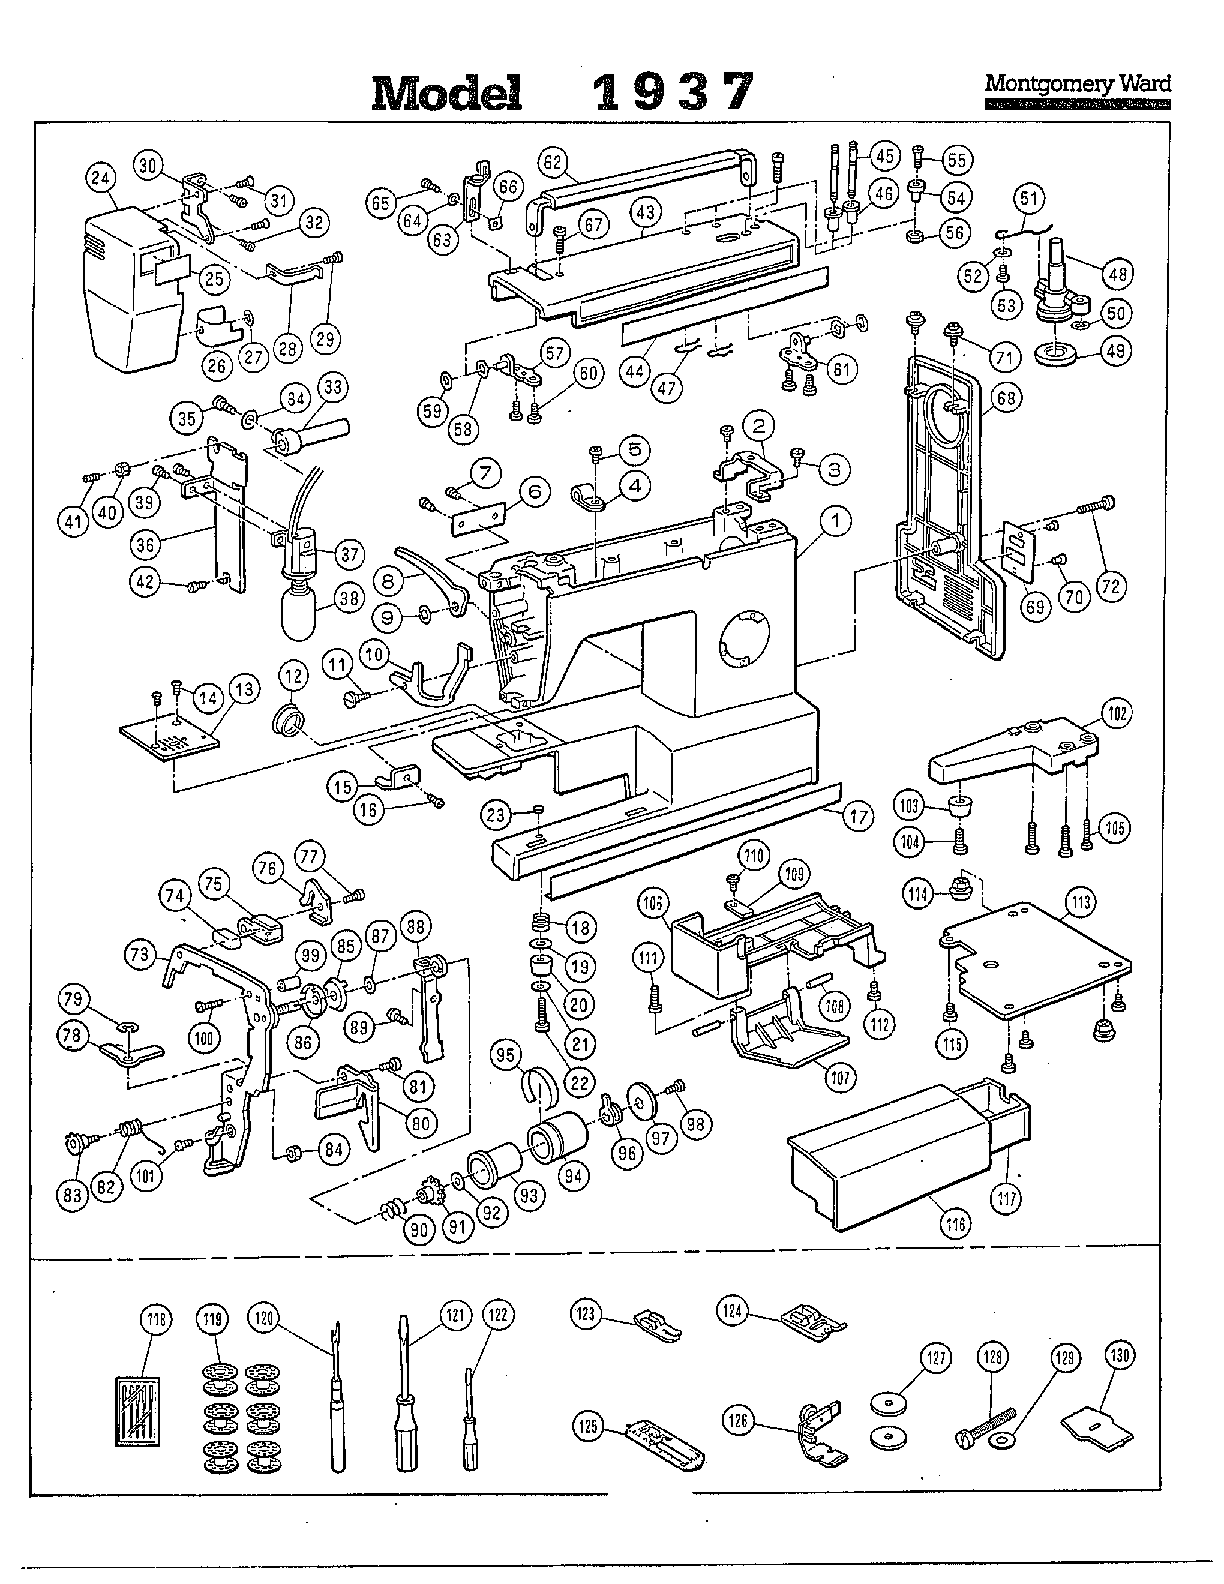 elna sewing machine parts diagram network interface device list